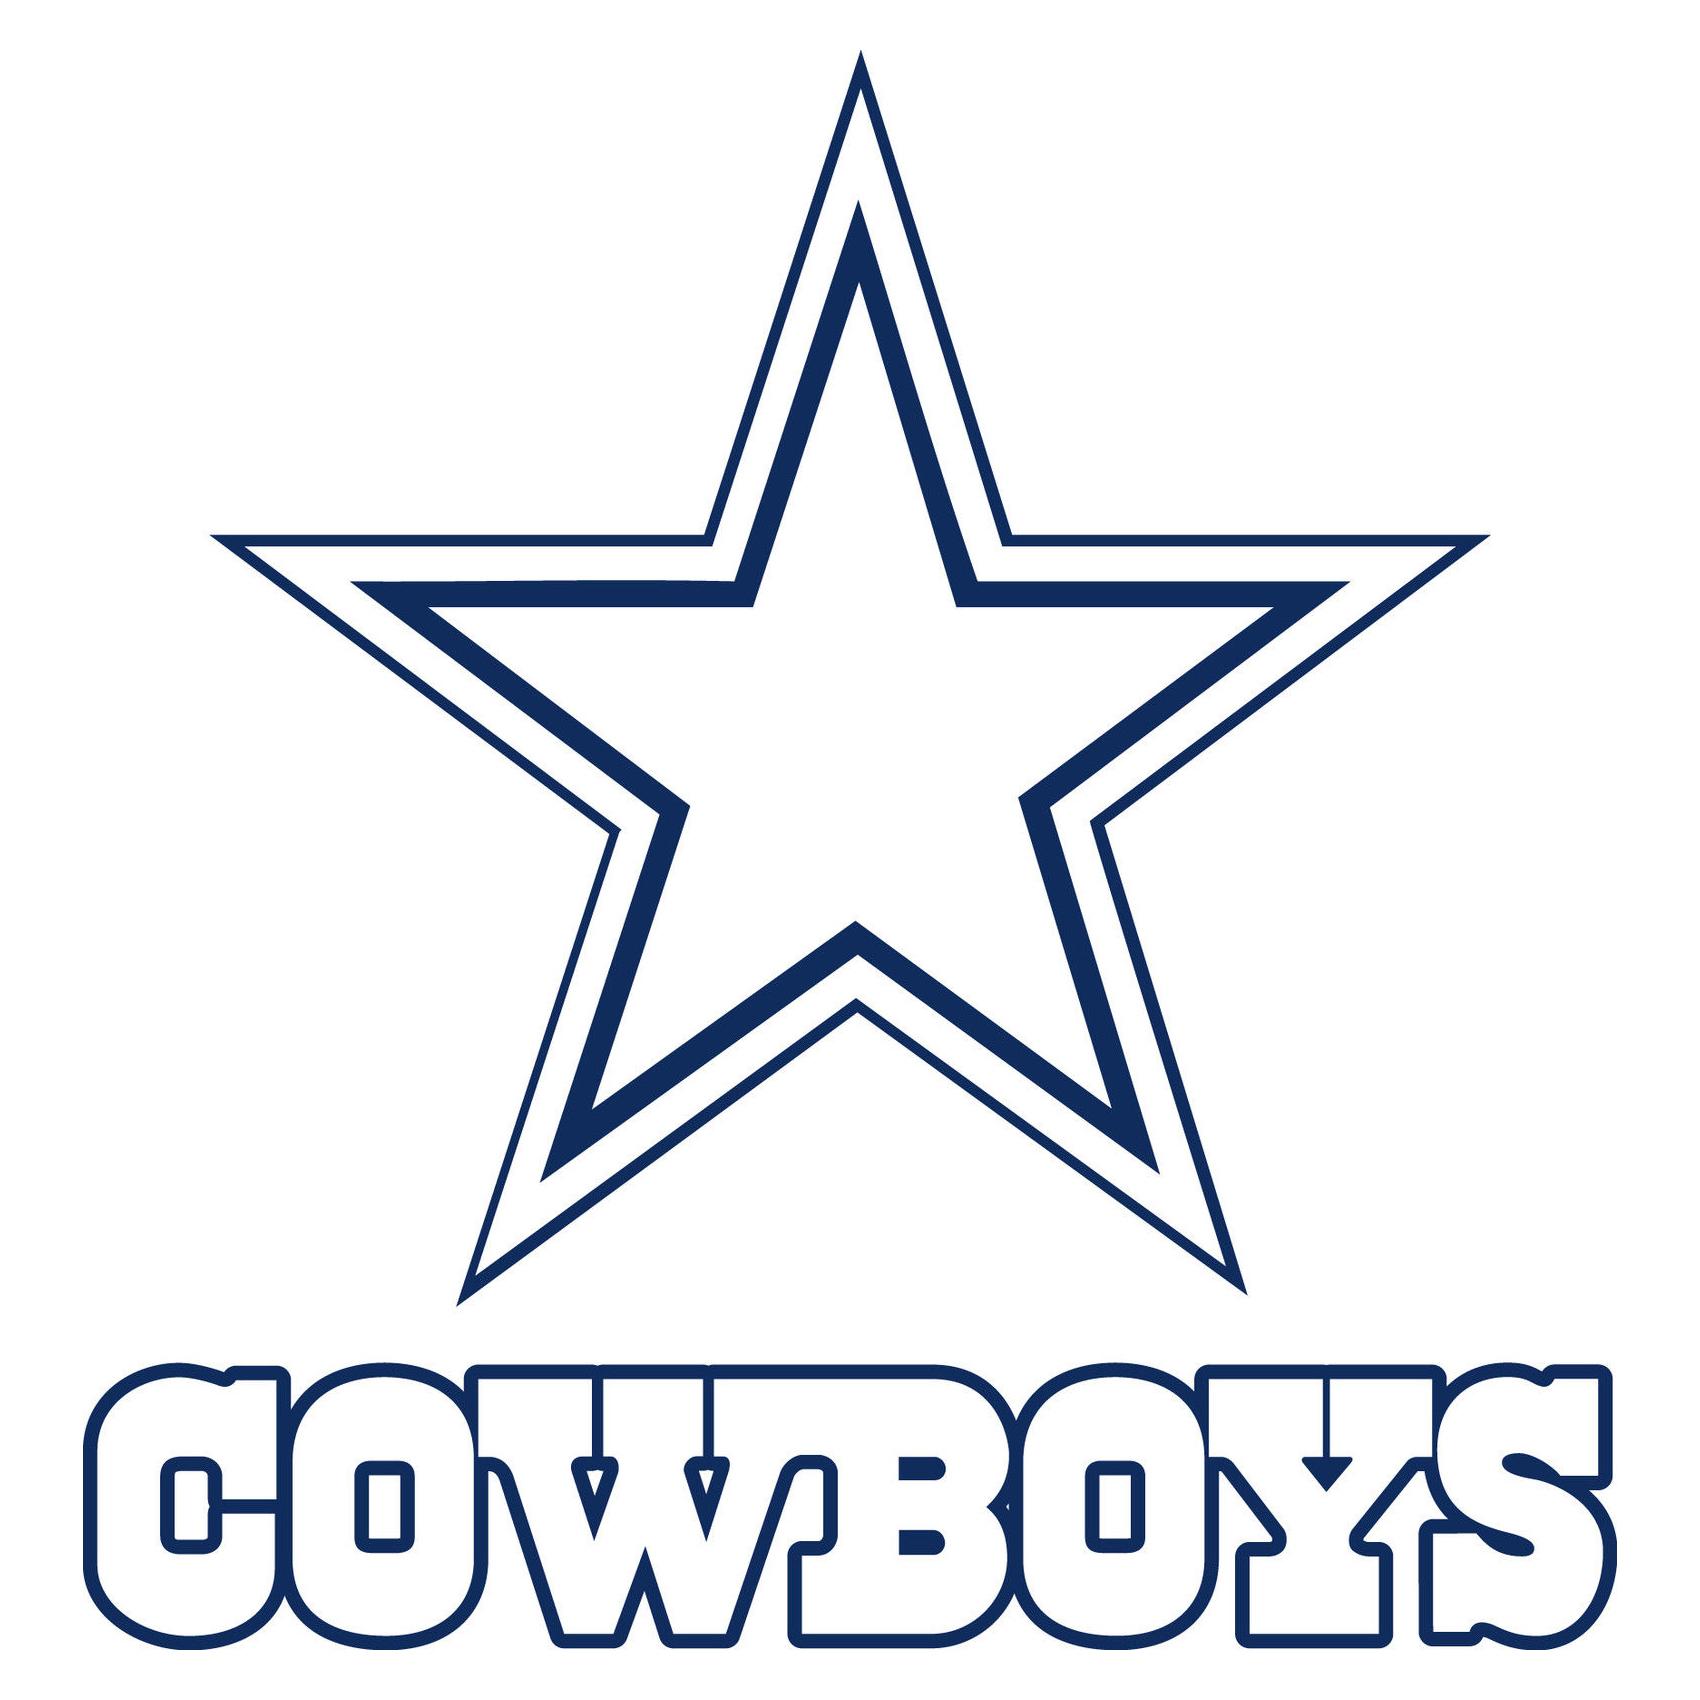 hight resolution of 1700x1700 dallas cowboys logo dallas cowboys symbol meaning history